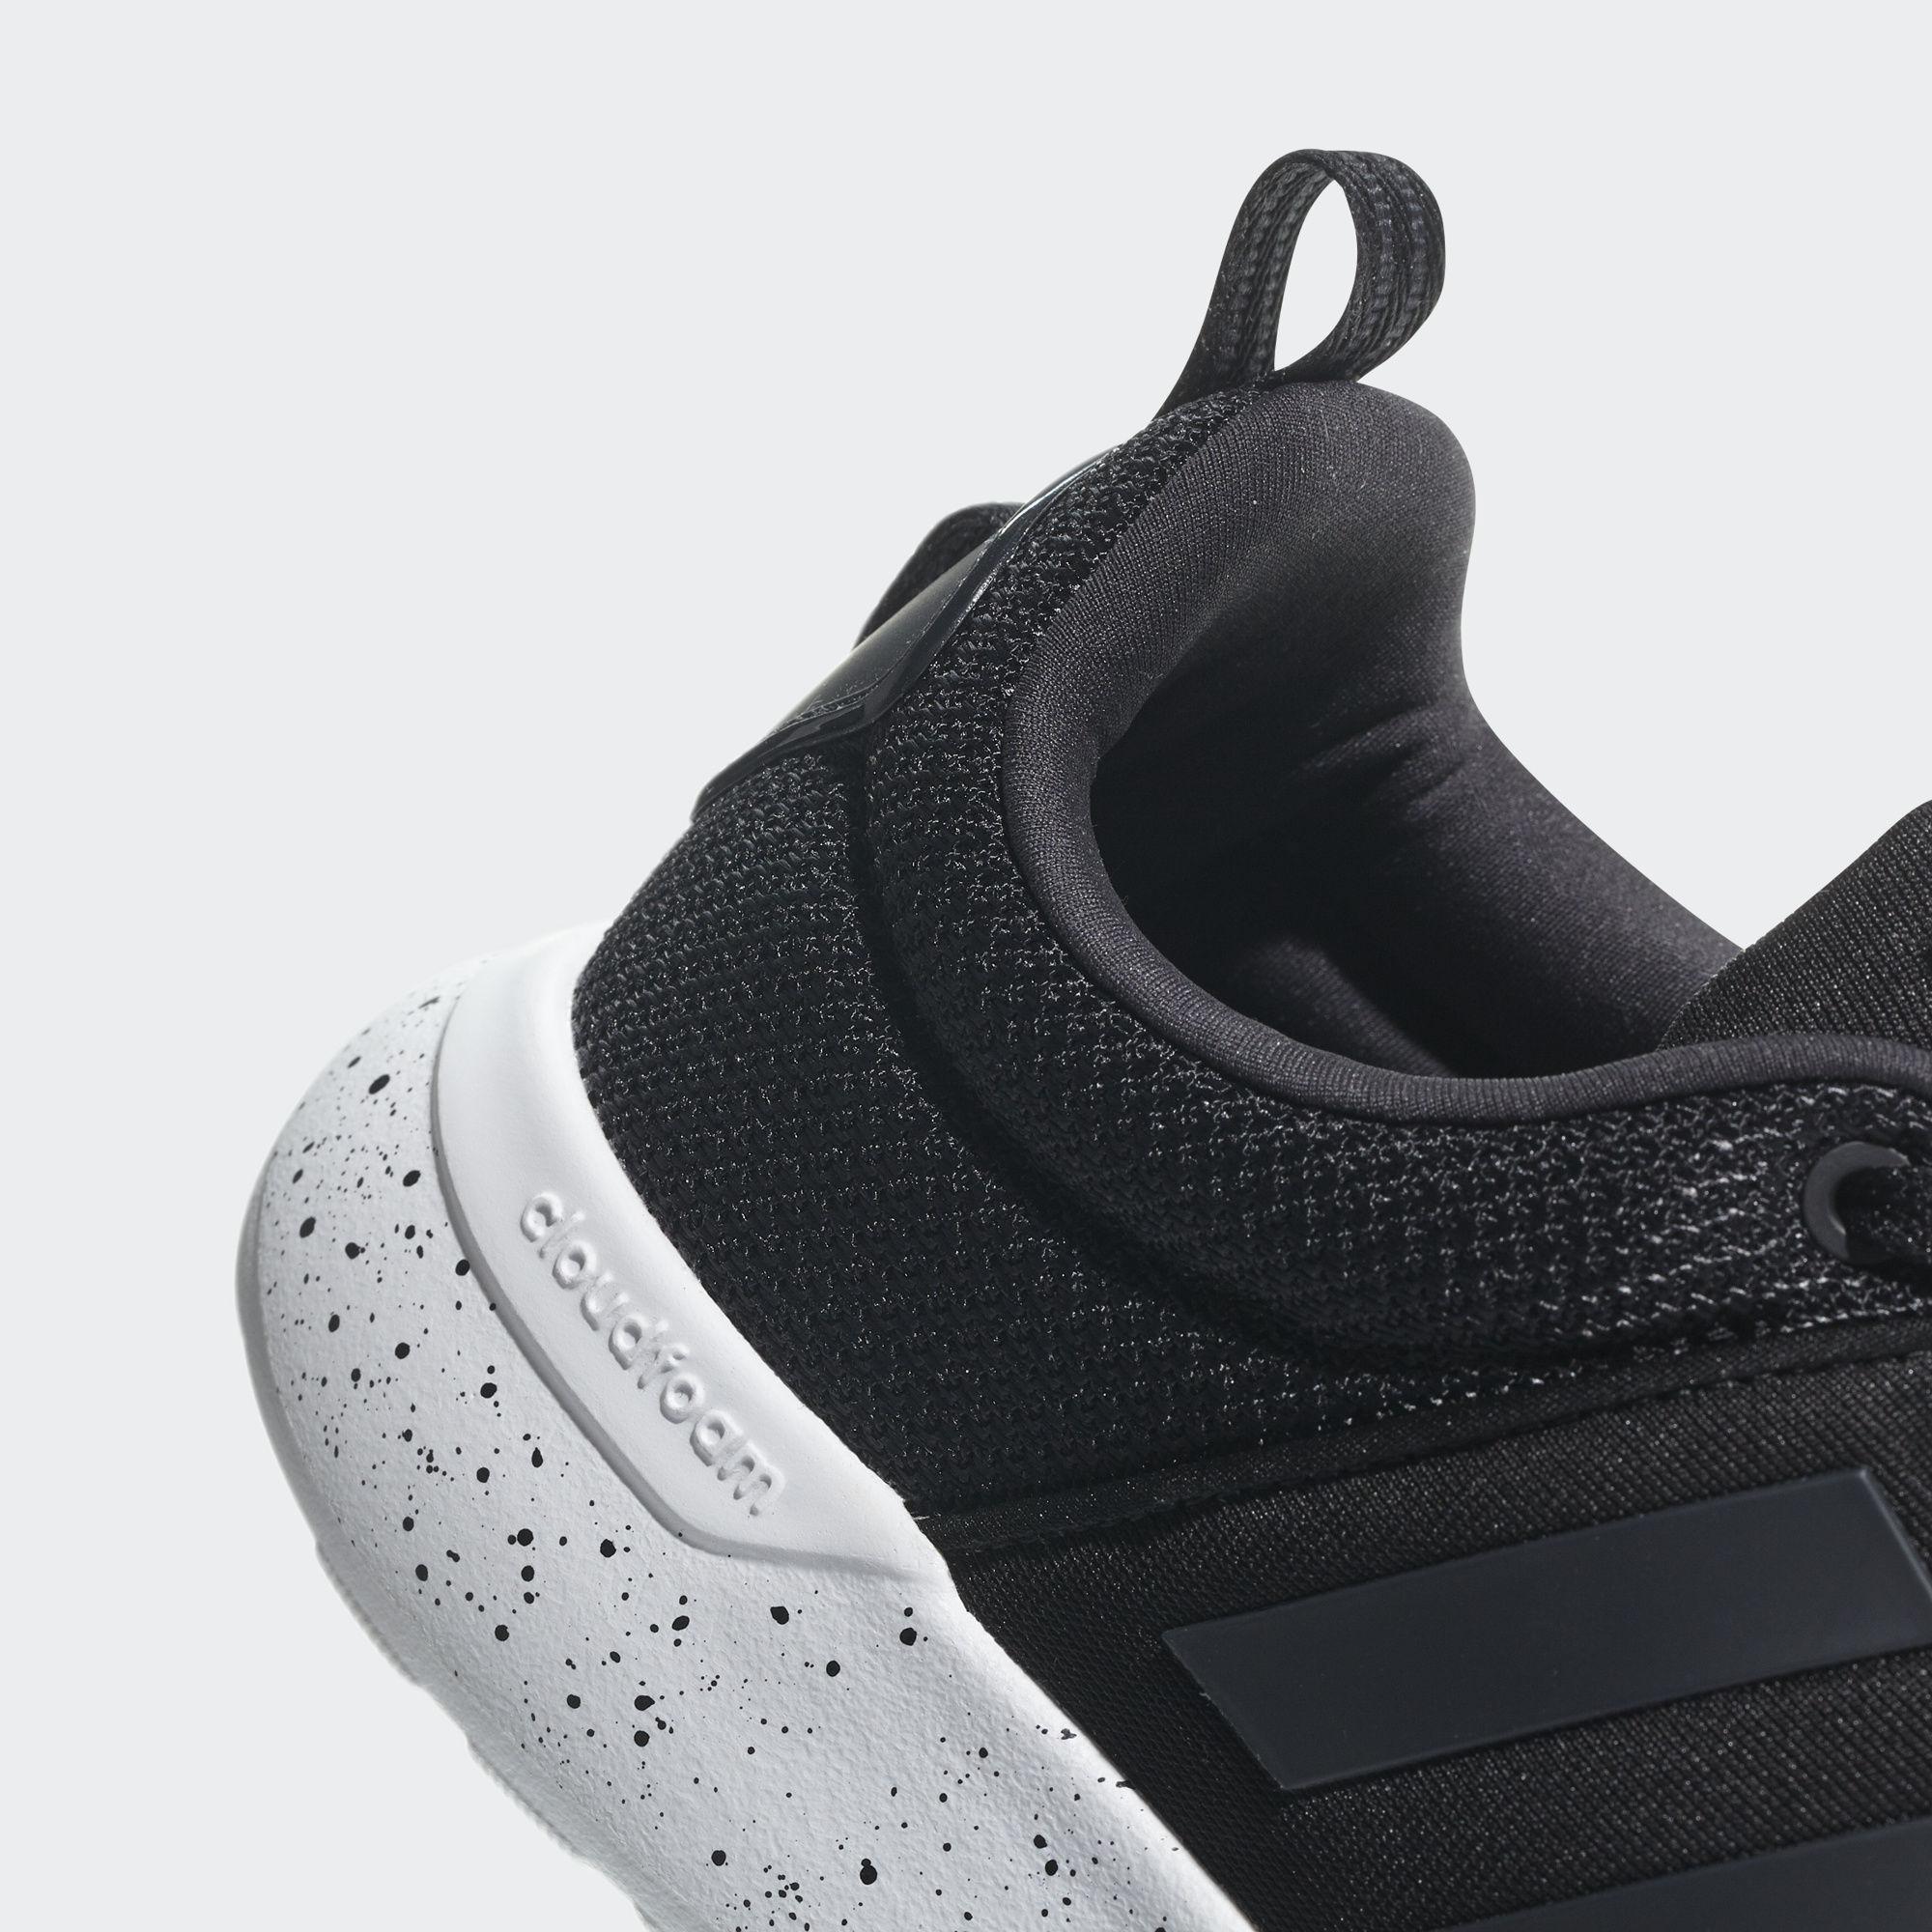 c4e566f1812d DB0594 Adidas Scarpe Sneakers Running Sportive Ginnastica Tennis Cf Lite  racer 4 4 sur 8 ...